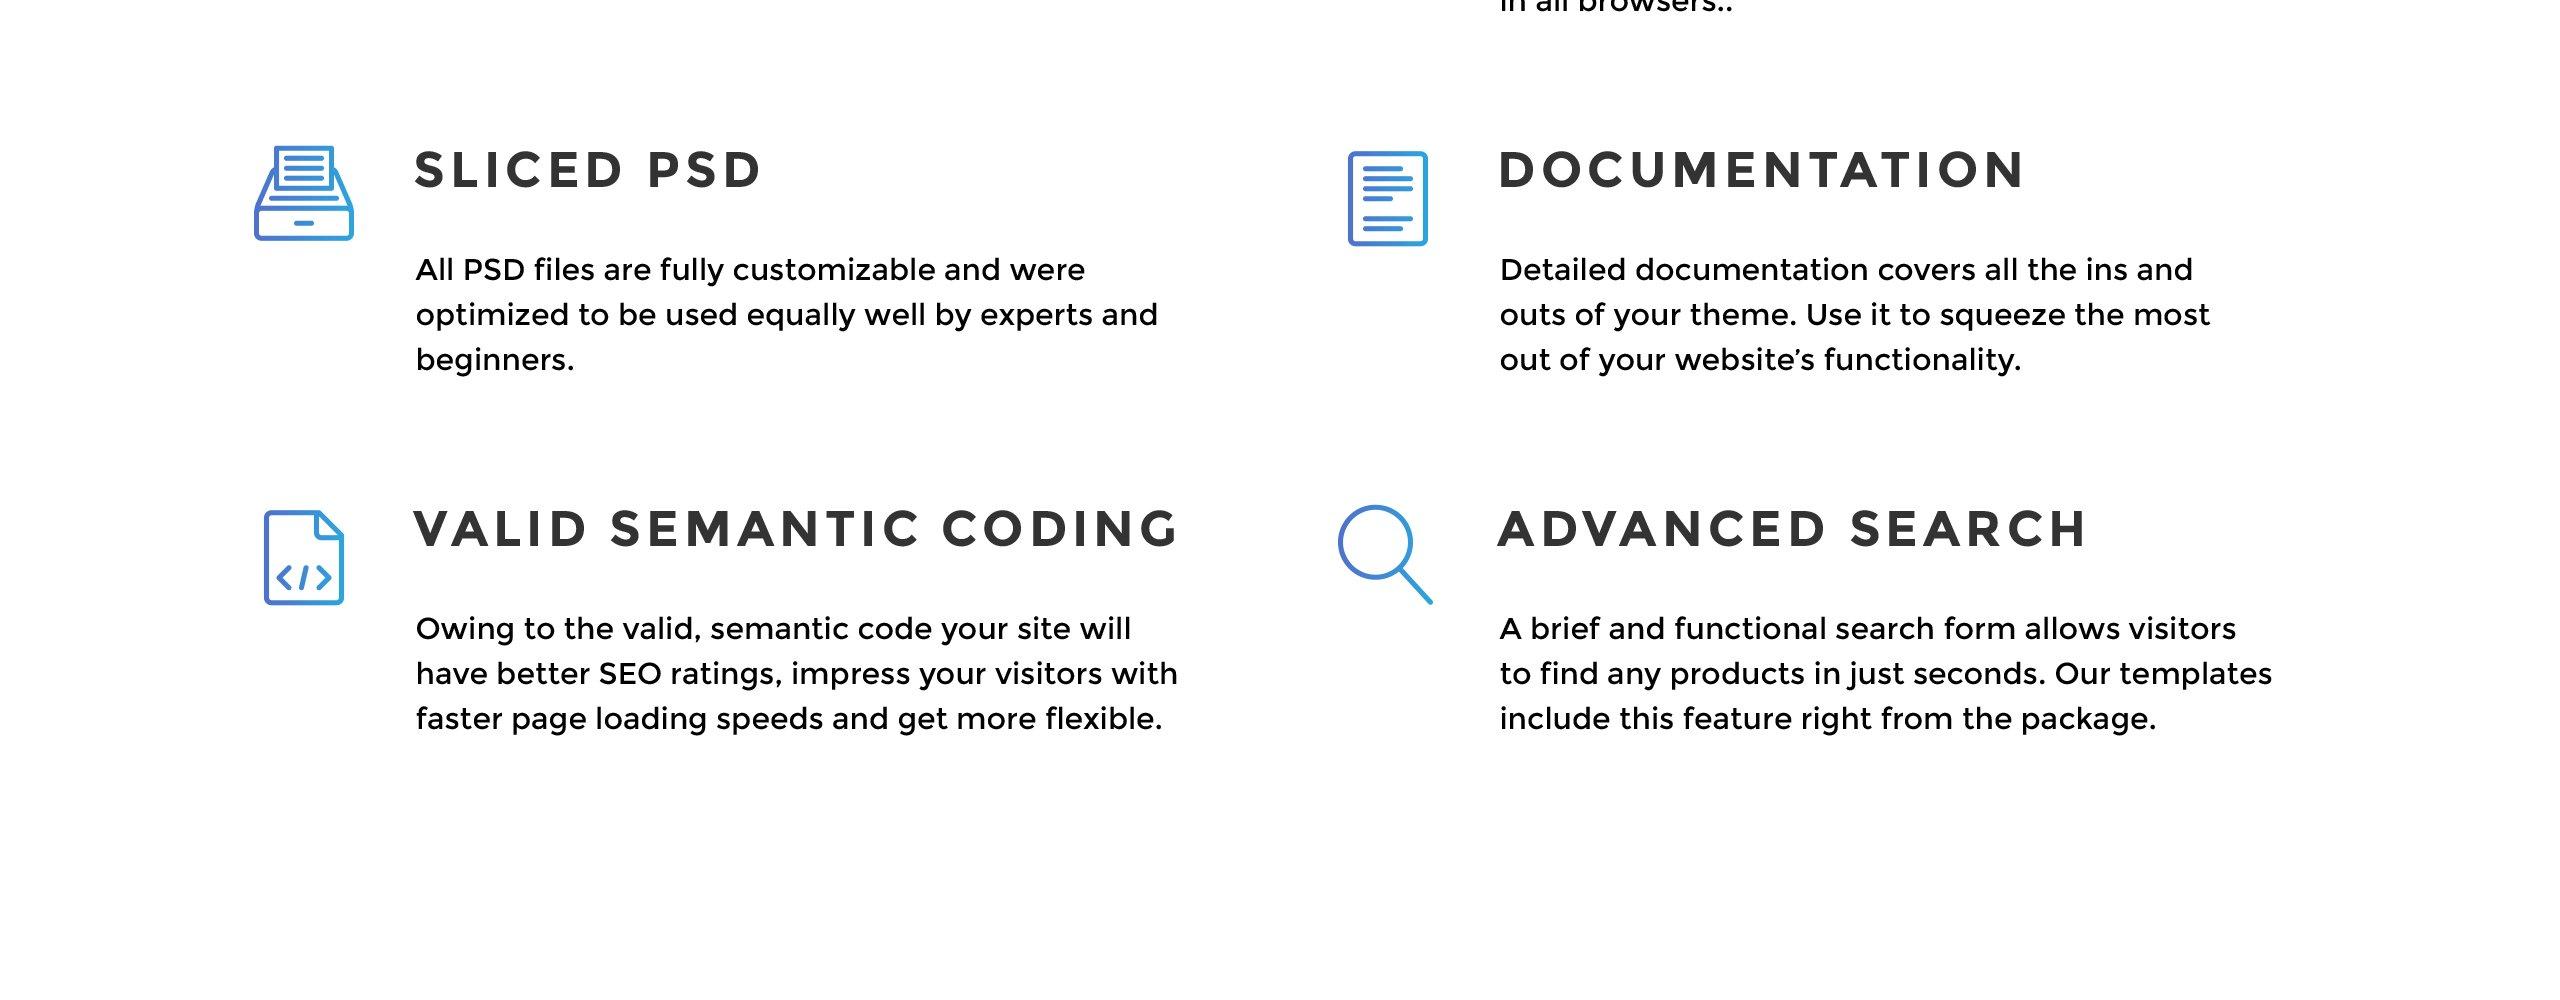 Website Design Template 70802 - blog post project service multipurpose responsive visual seo html